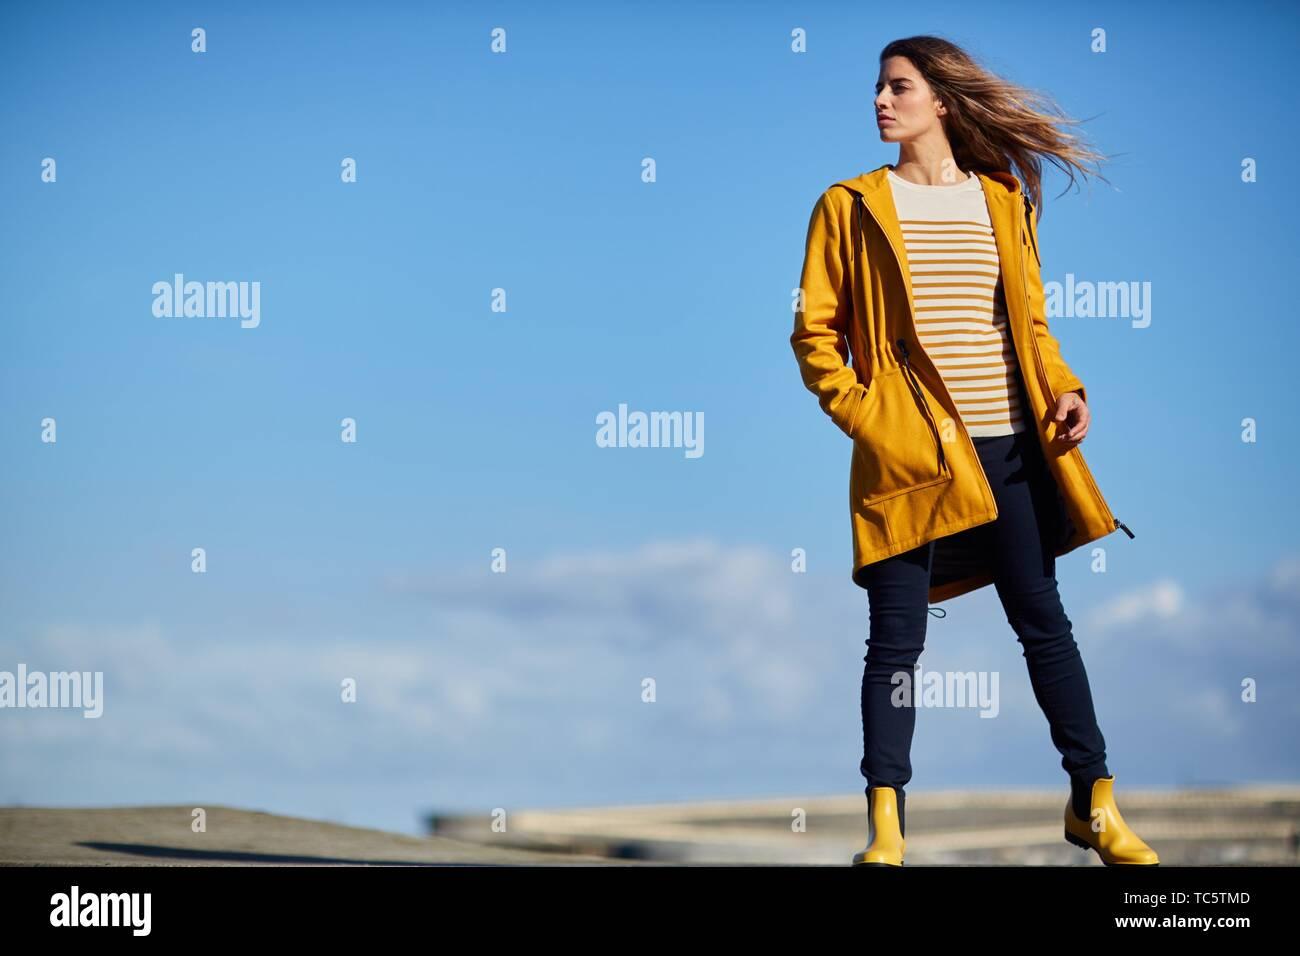 Junge Frau, Port, Mutriku, Gipuzkoa, Baskenland, Spanien Stockfoto